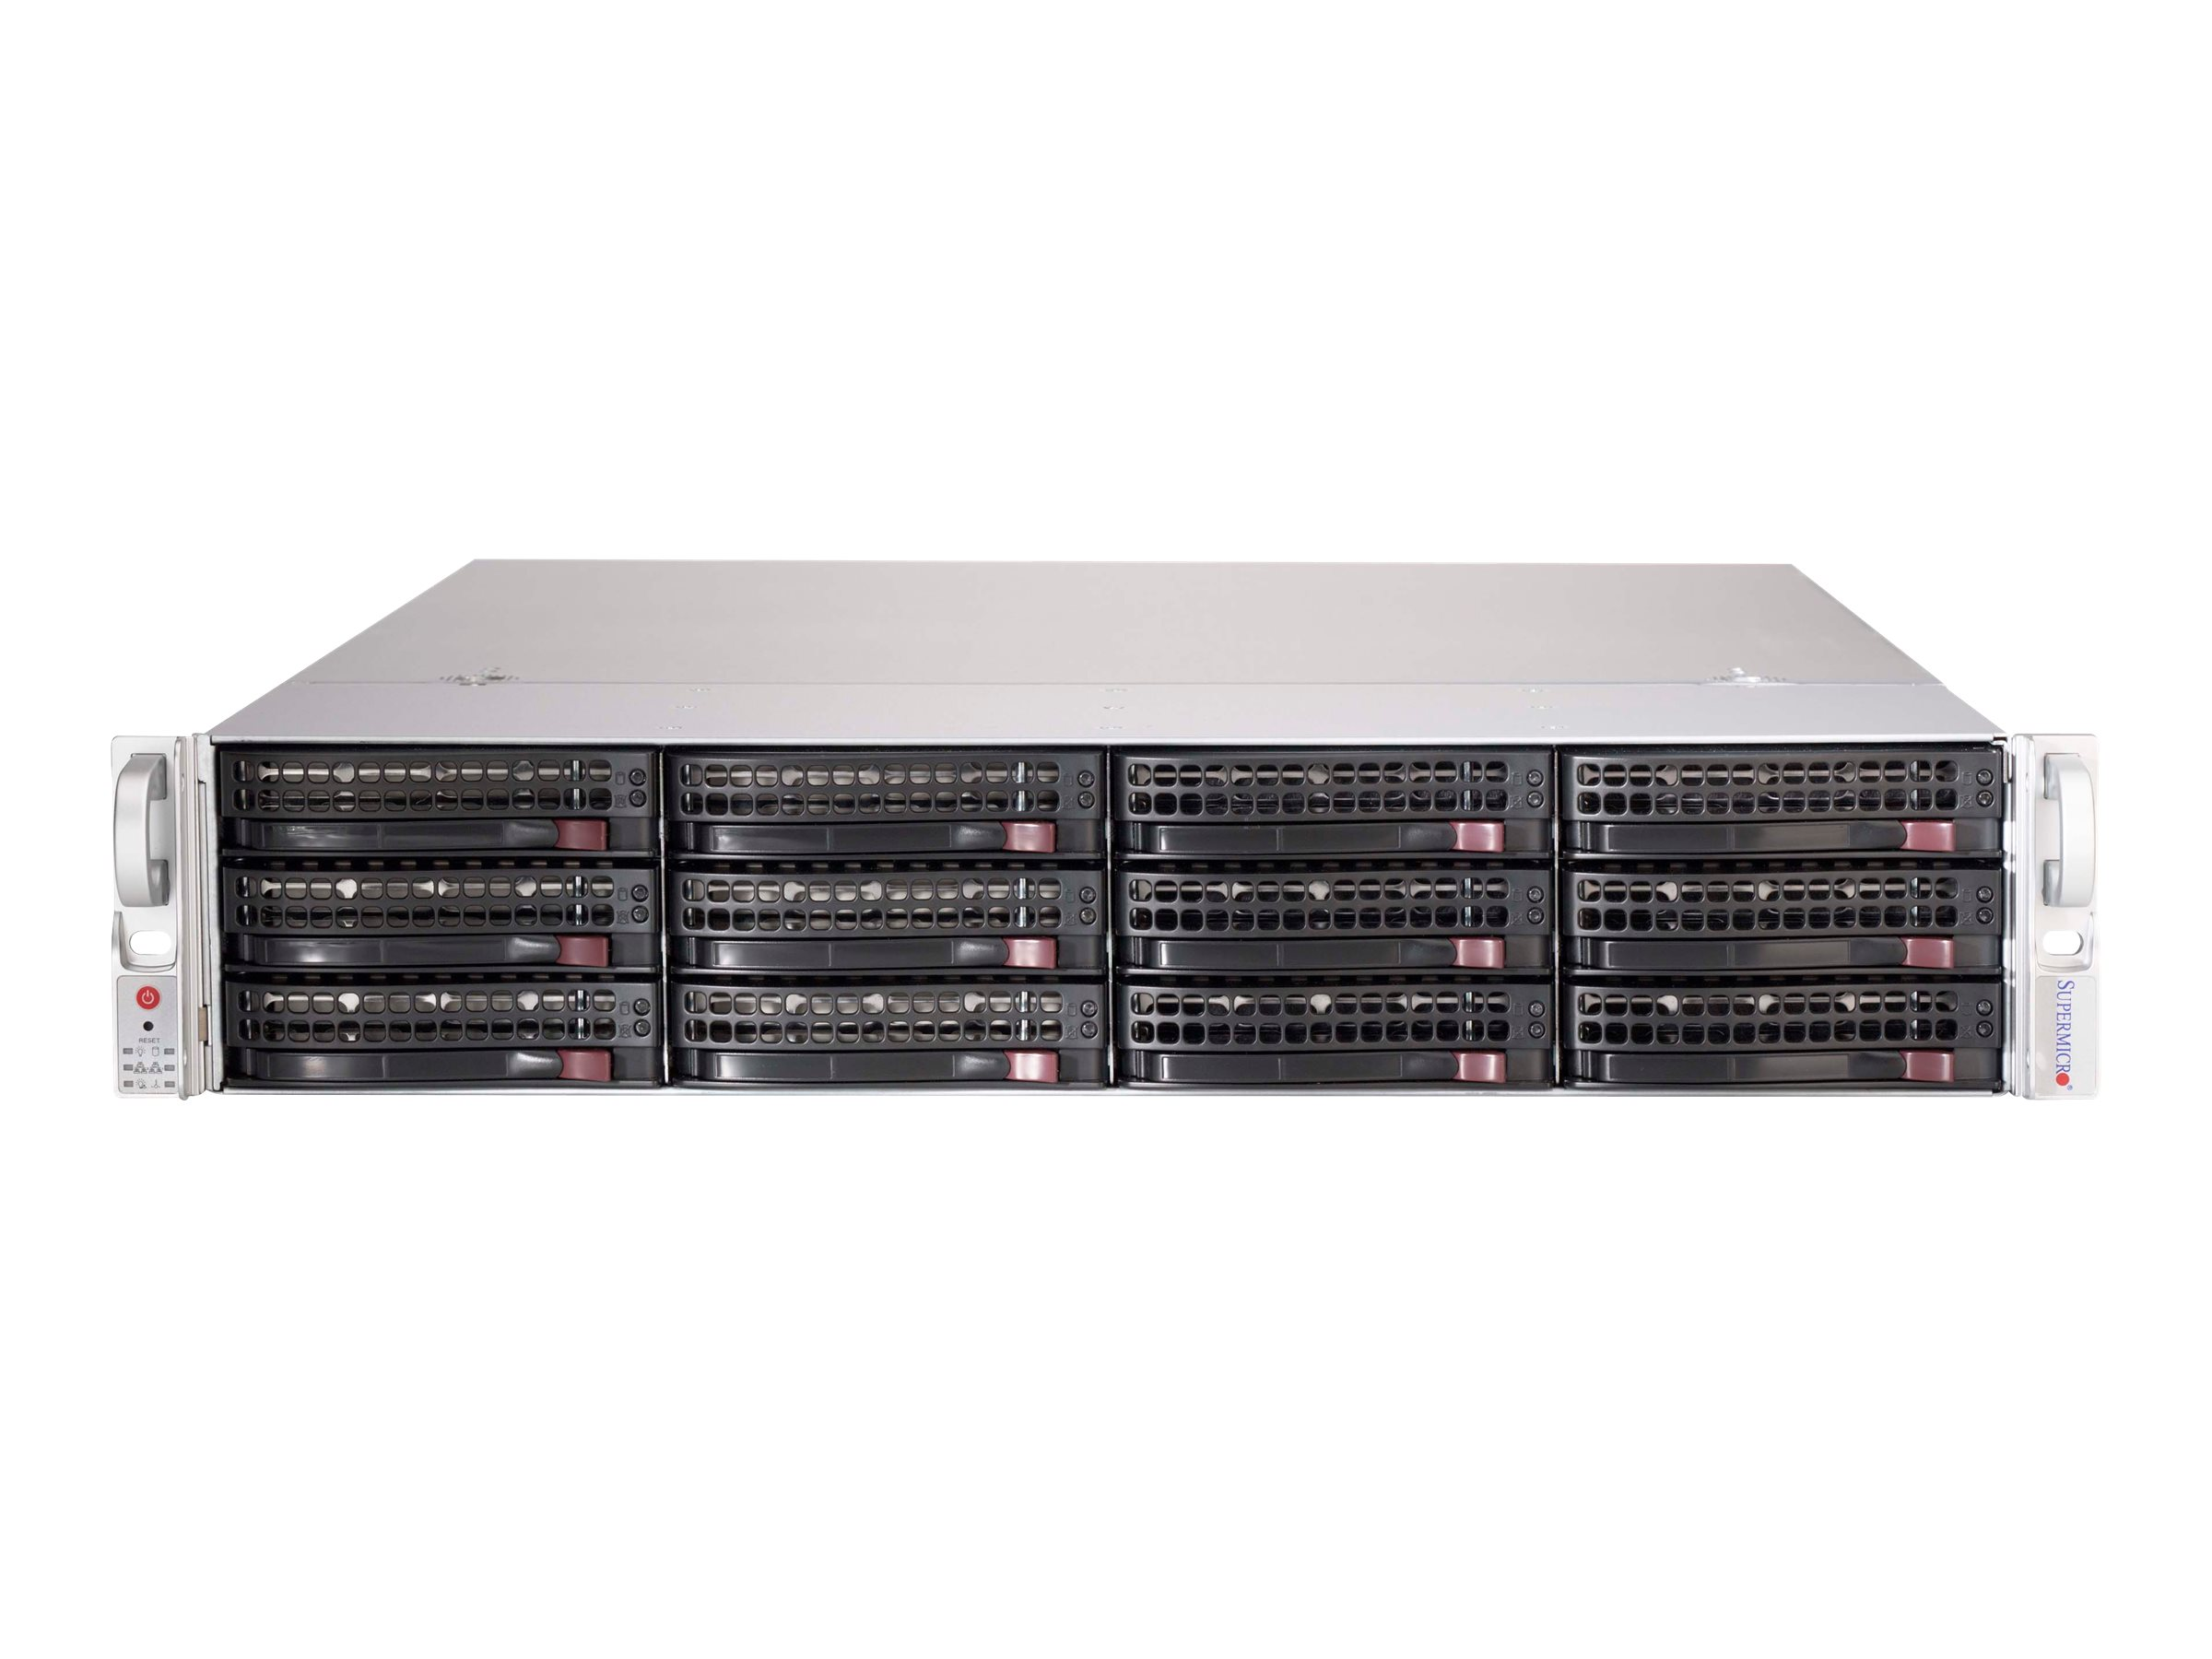 Supermicro SC826 BE1C-R741JBOD - Rack-Montage - 2U - SATA/SAS - Hot-Swap 740 Watt - Schwarz